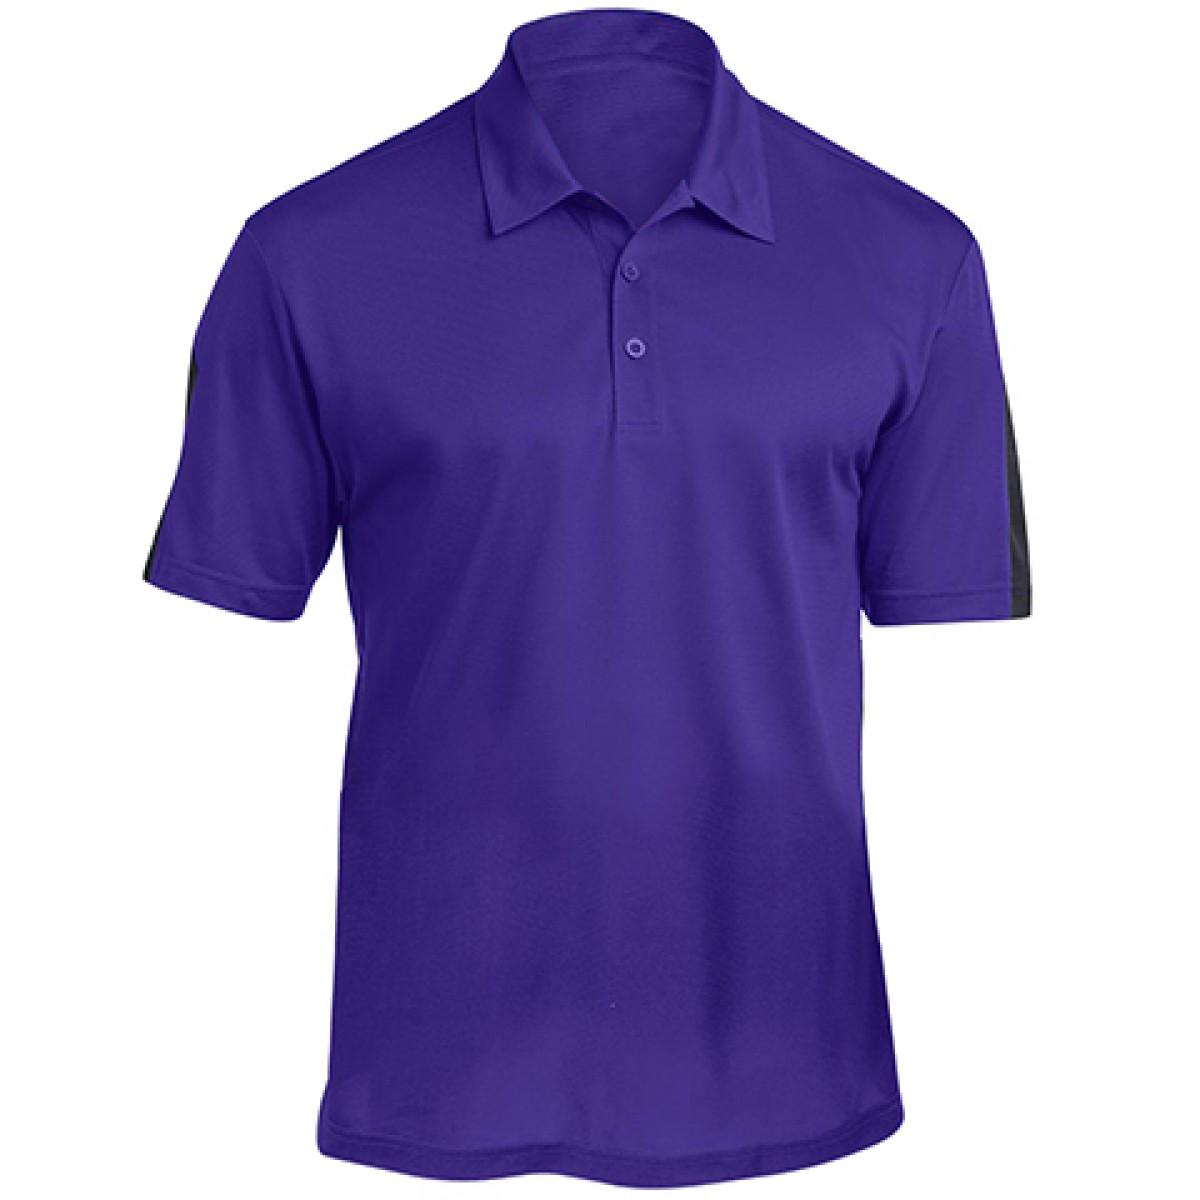 Textured Colorblock Polo-Purple/Black-XL